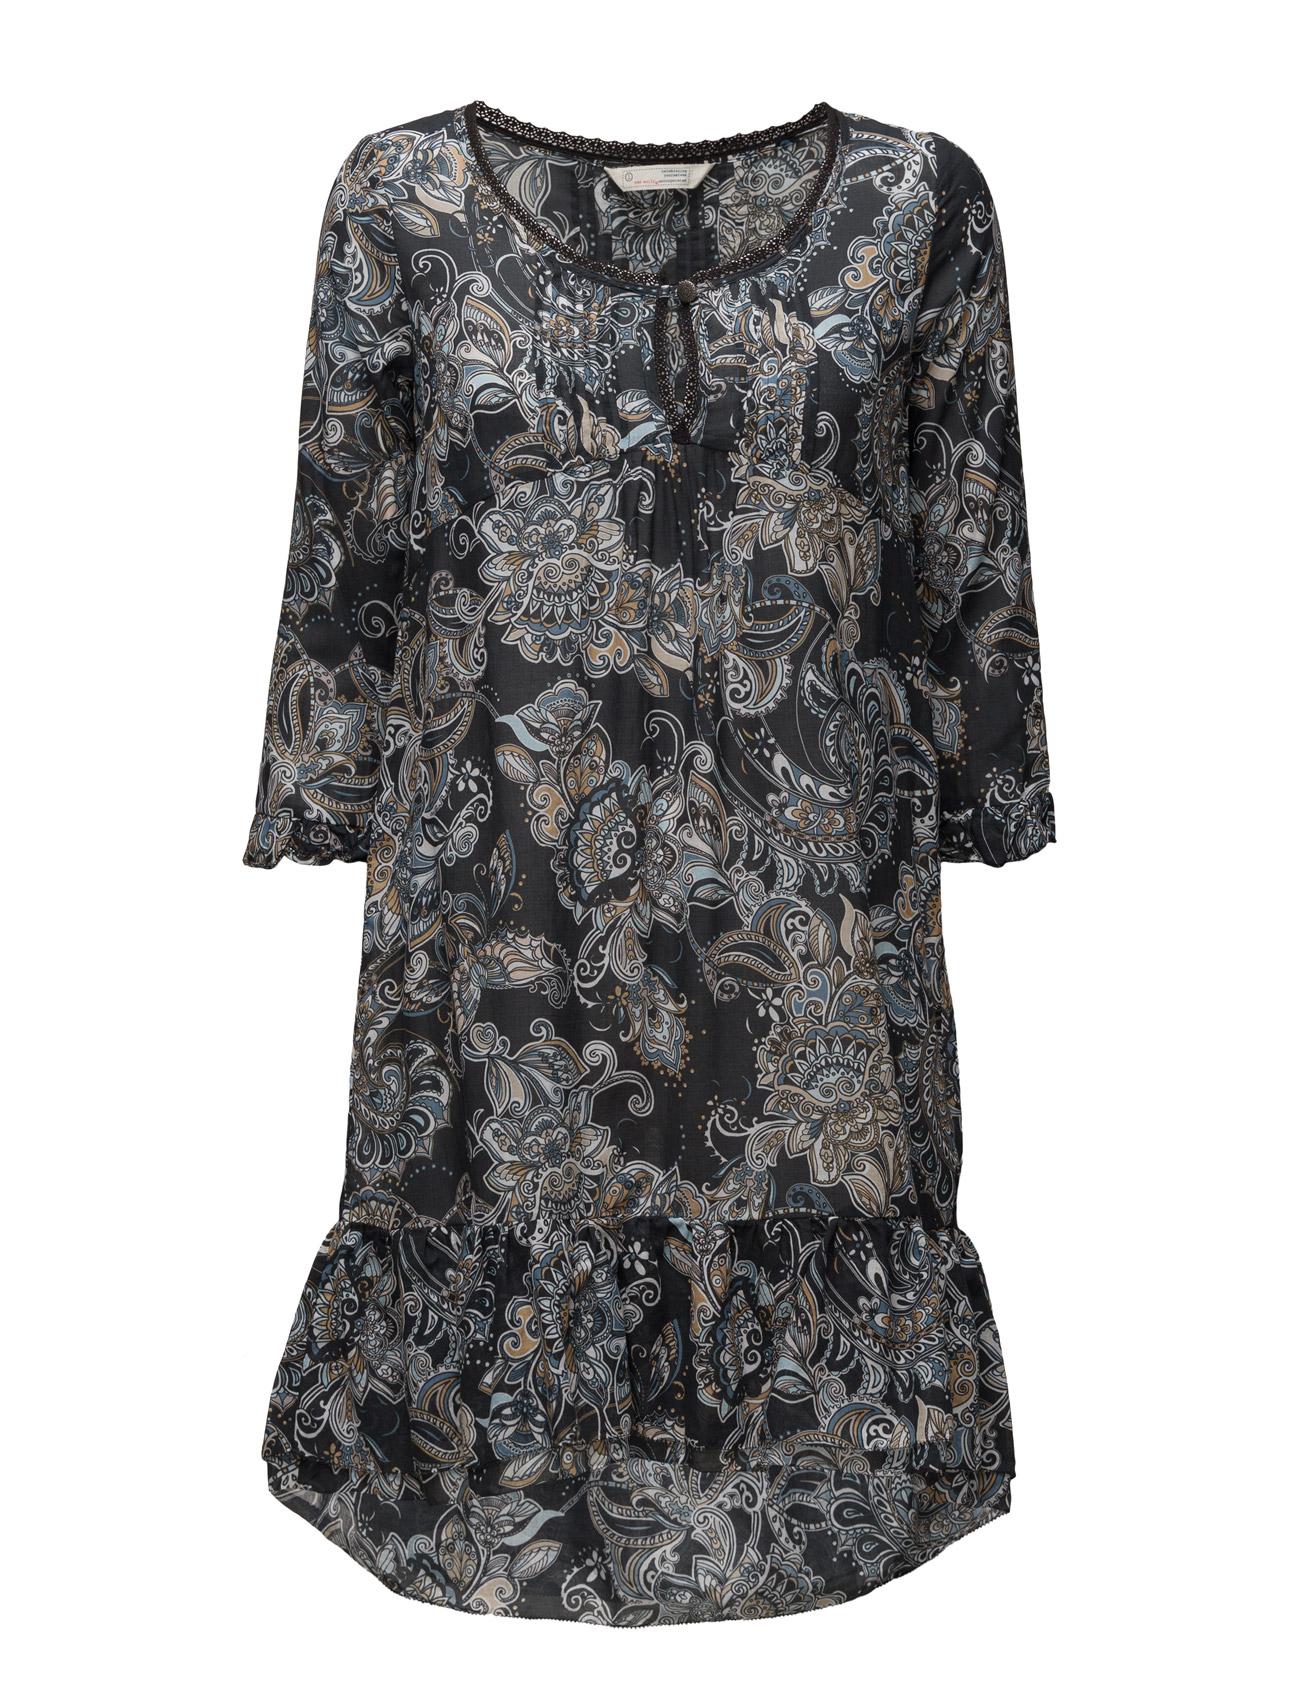 Little Piece Dress ODD MOLLY Kjoler til Kvinder i Asfalt